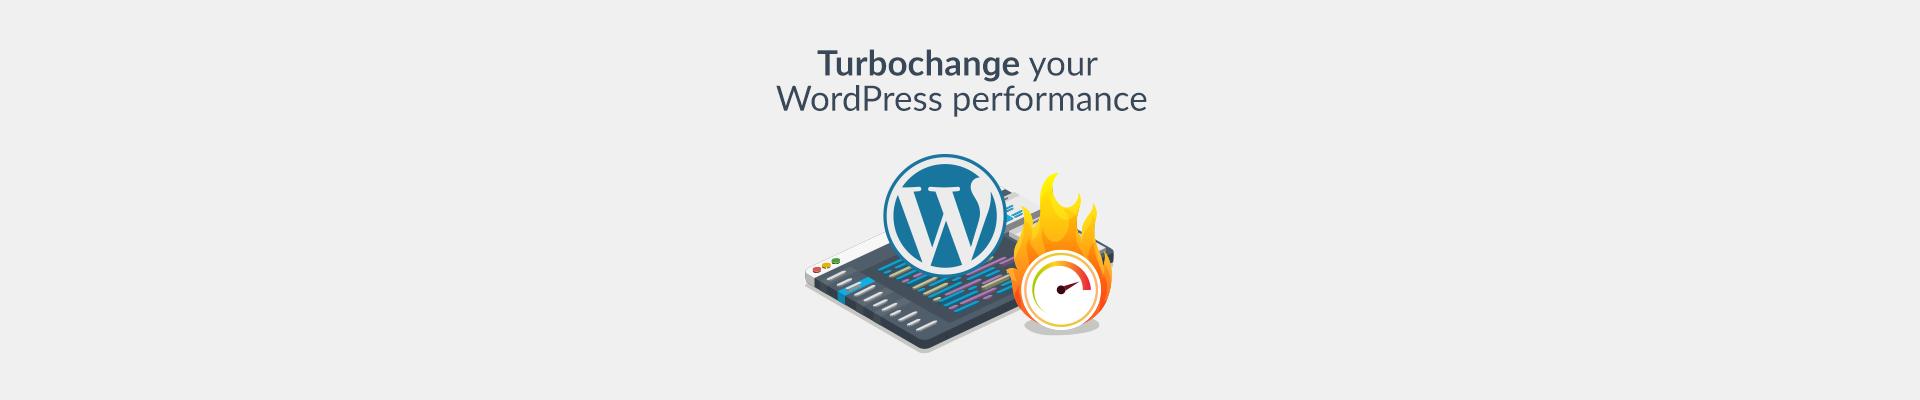 Turbocharge your WordPress Performance - Plesk